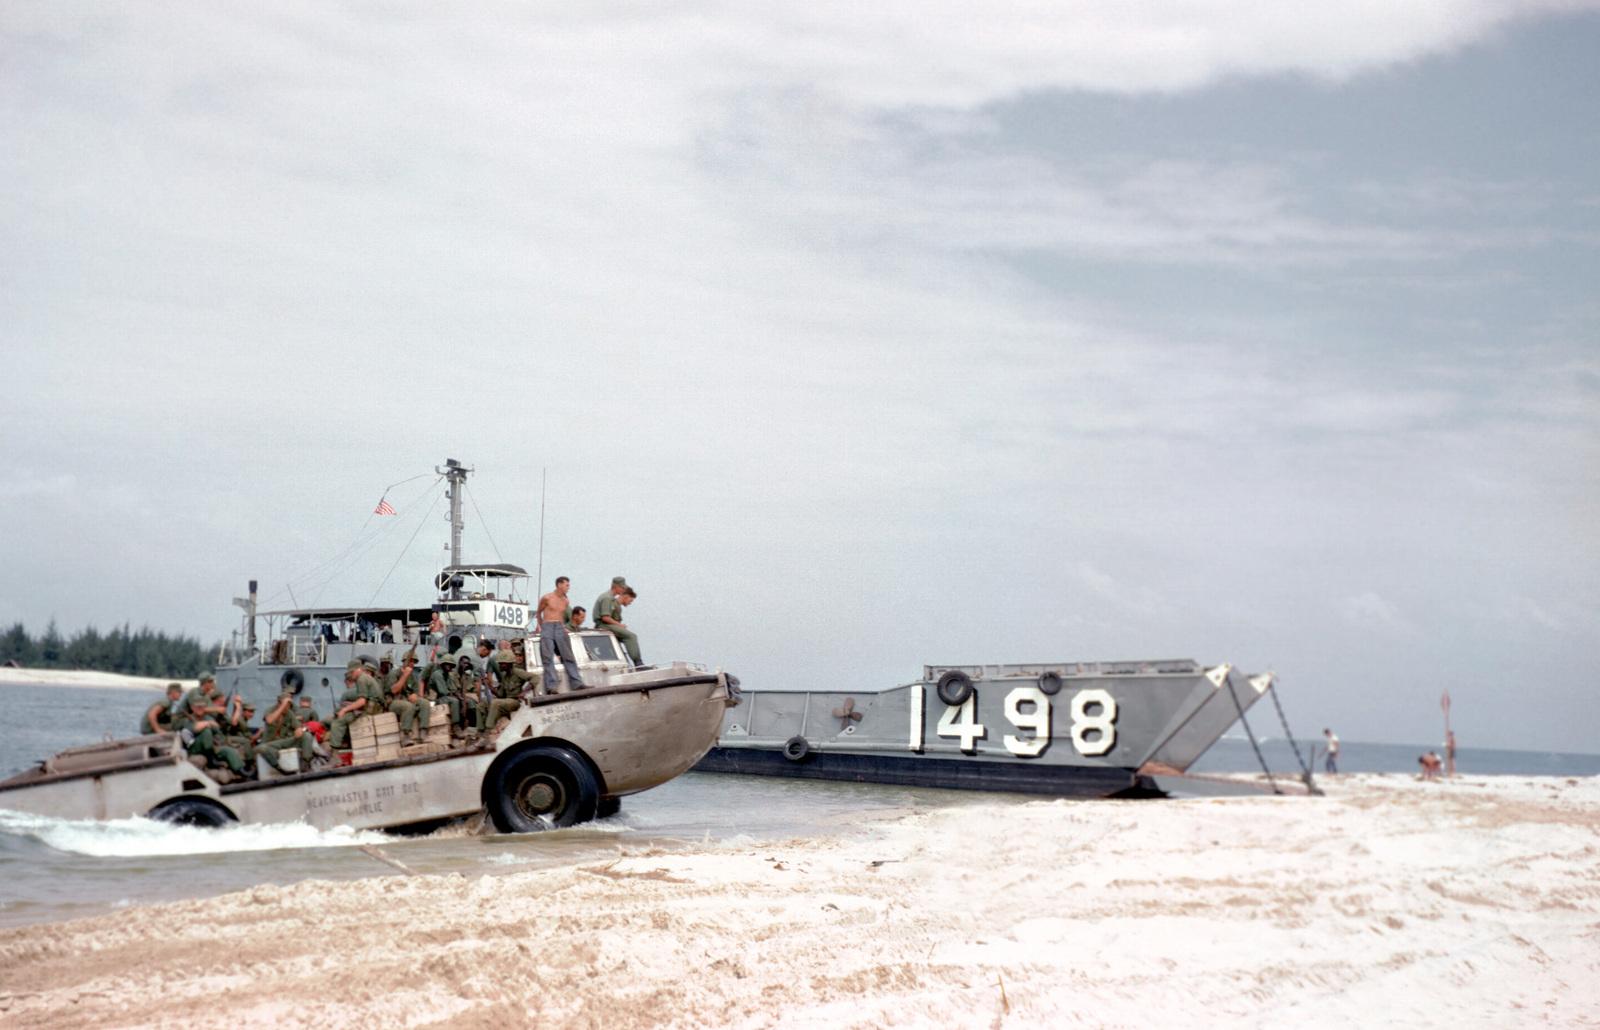 https://cdn10.picryl.com/photo/1966/10/01/a-starboard-bow-view-of-utility-landing-craft-1498-lcu-1498-beached-at-cua-5b77bc-1600.jpg